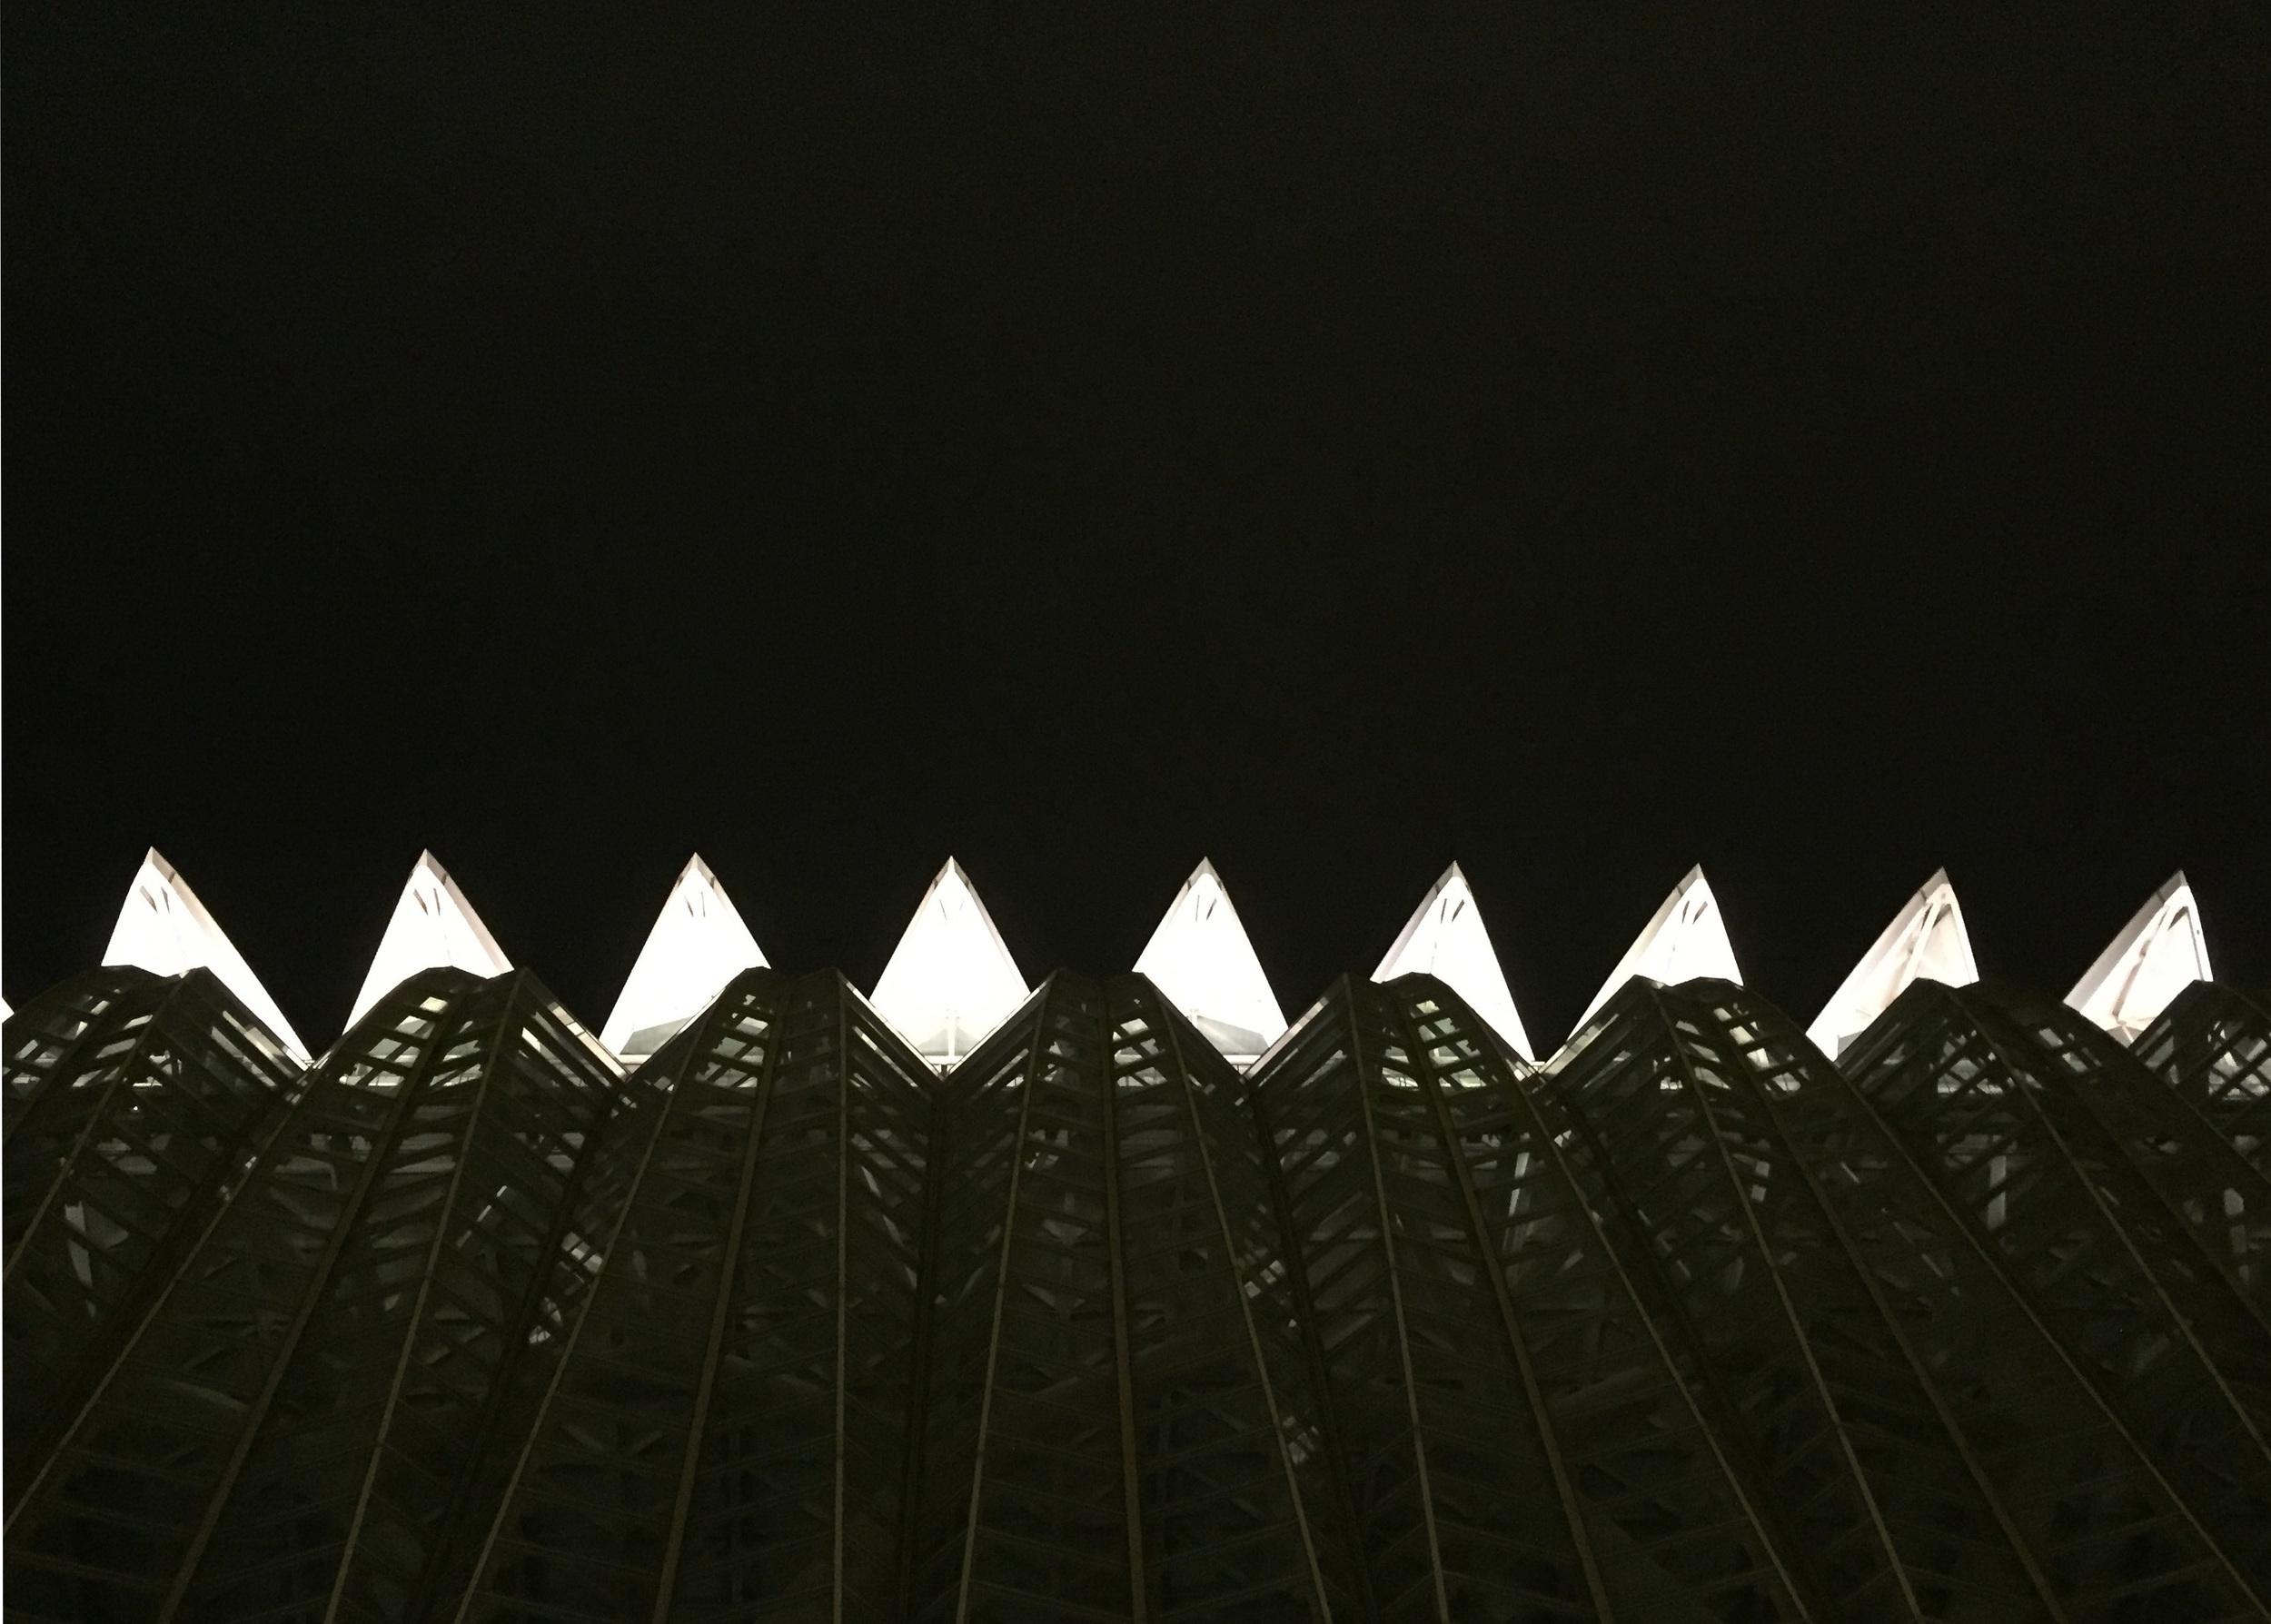 night spikes.jpg